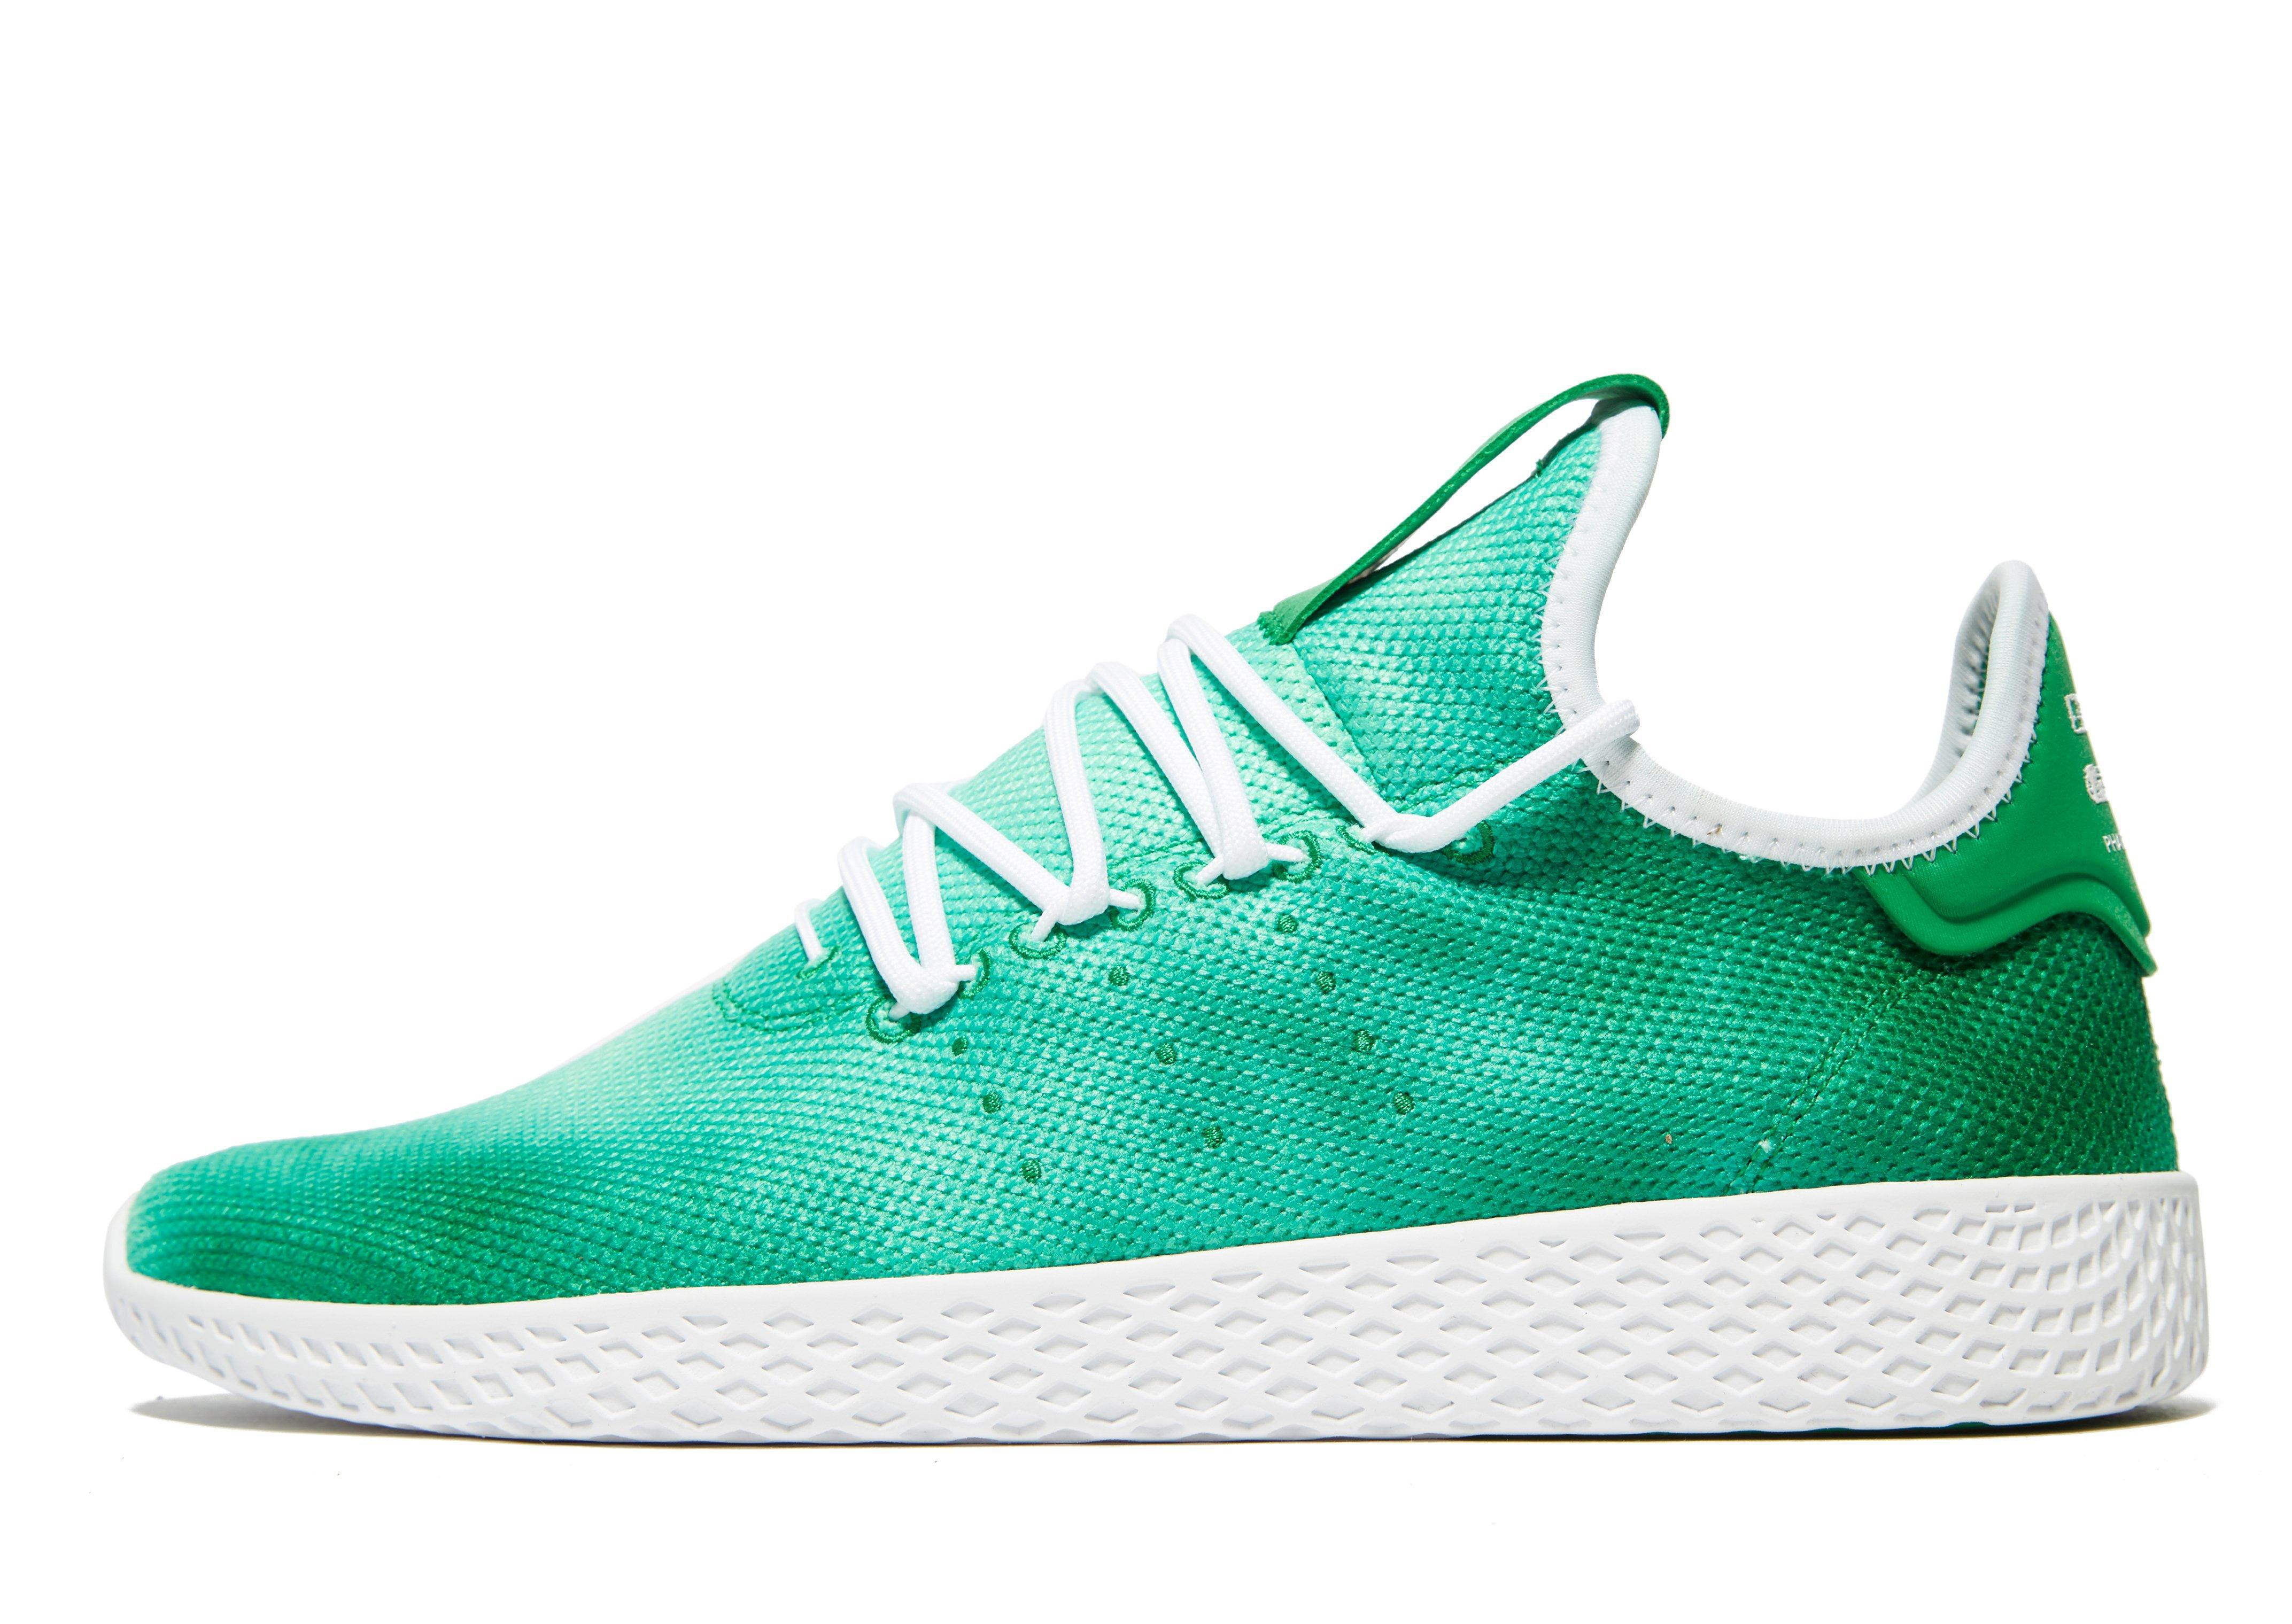 dd92b9e30 ... release date lyst adidas originals x pharrell williams holi tennis hu  in green 314e0 81e7e